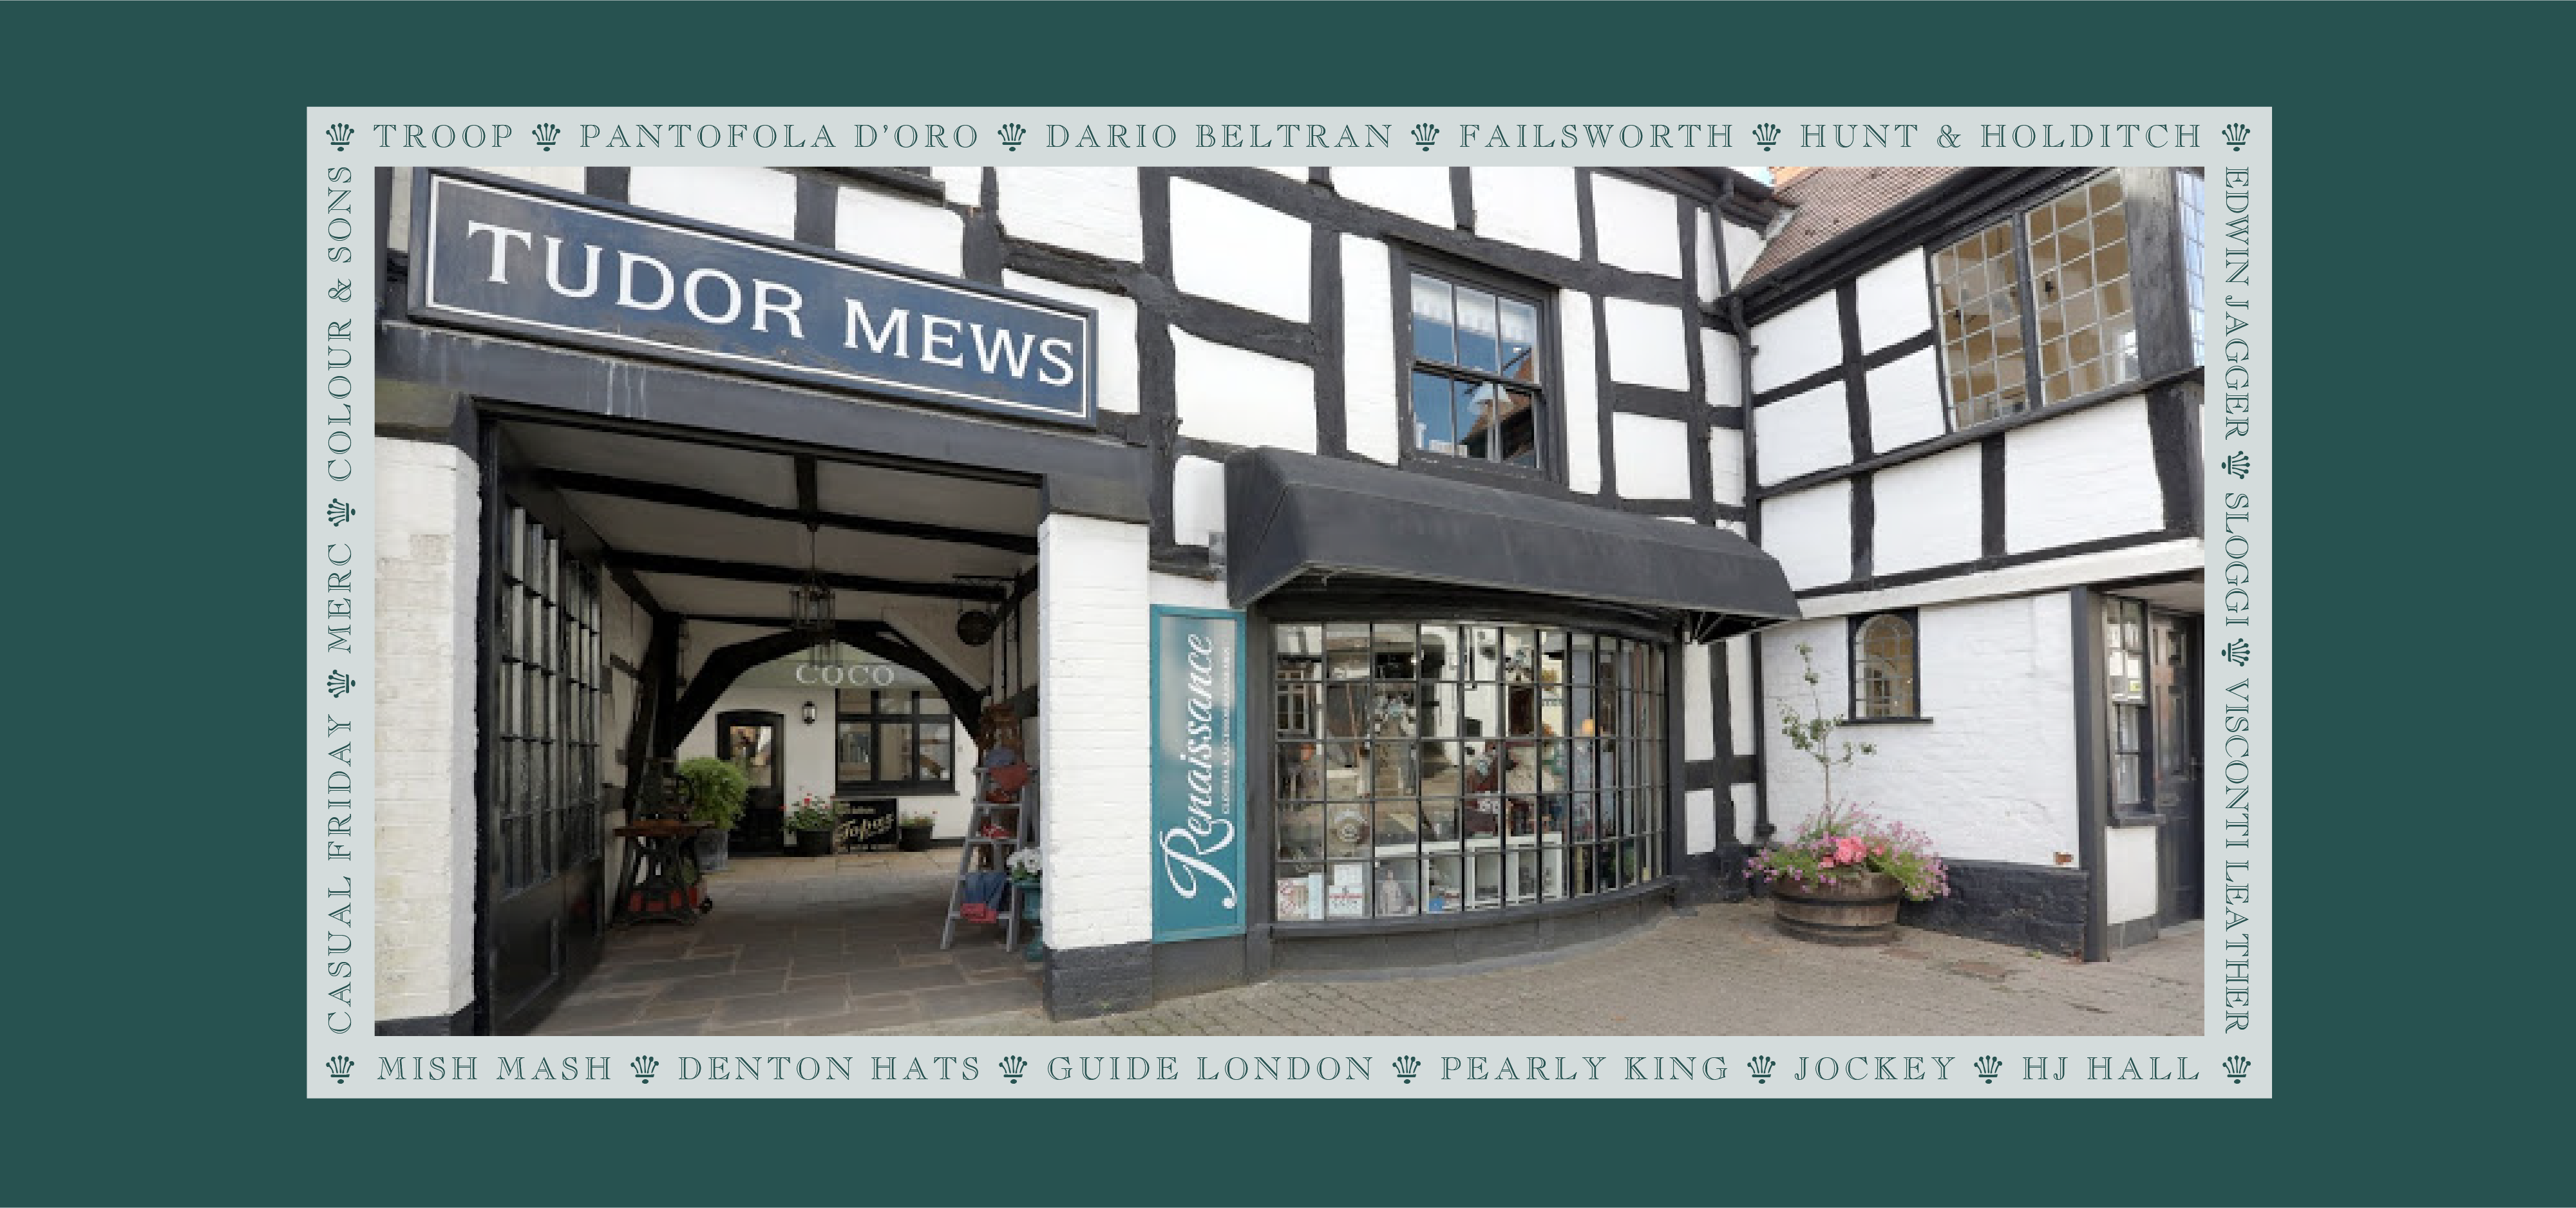 Renaissance Tudor Mews Ledbury